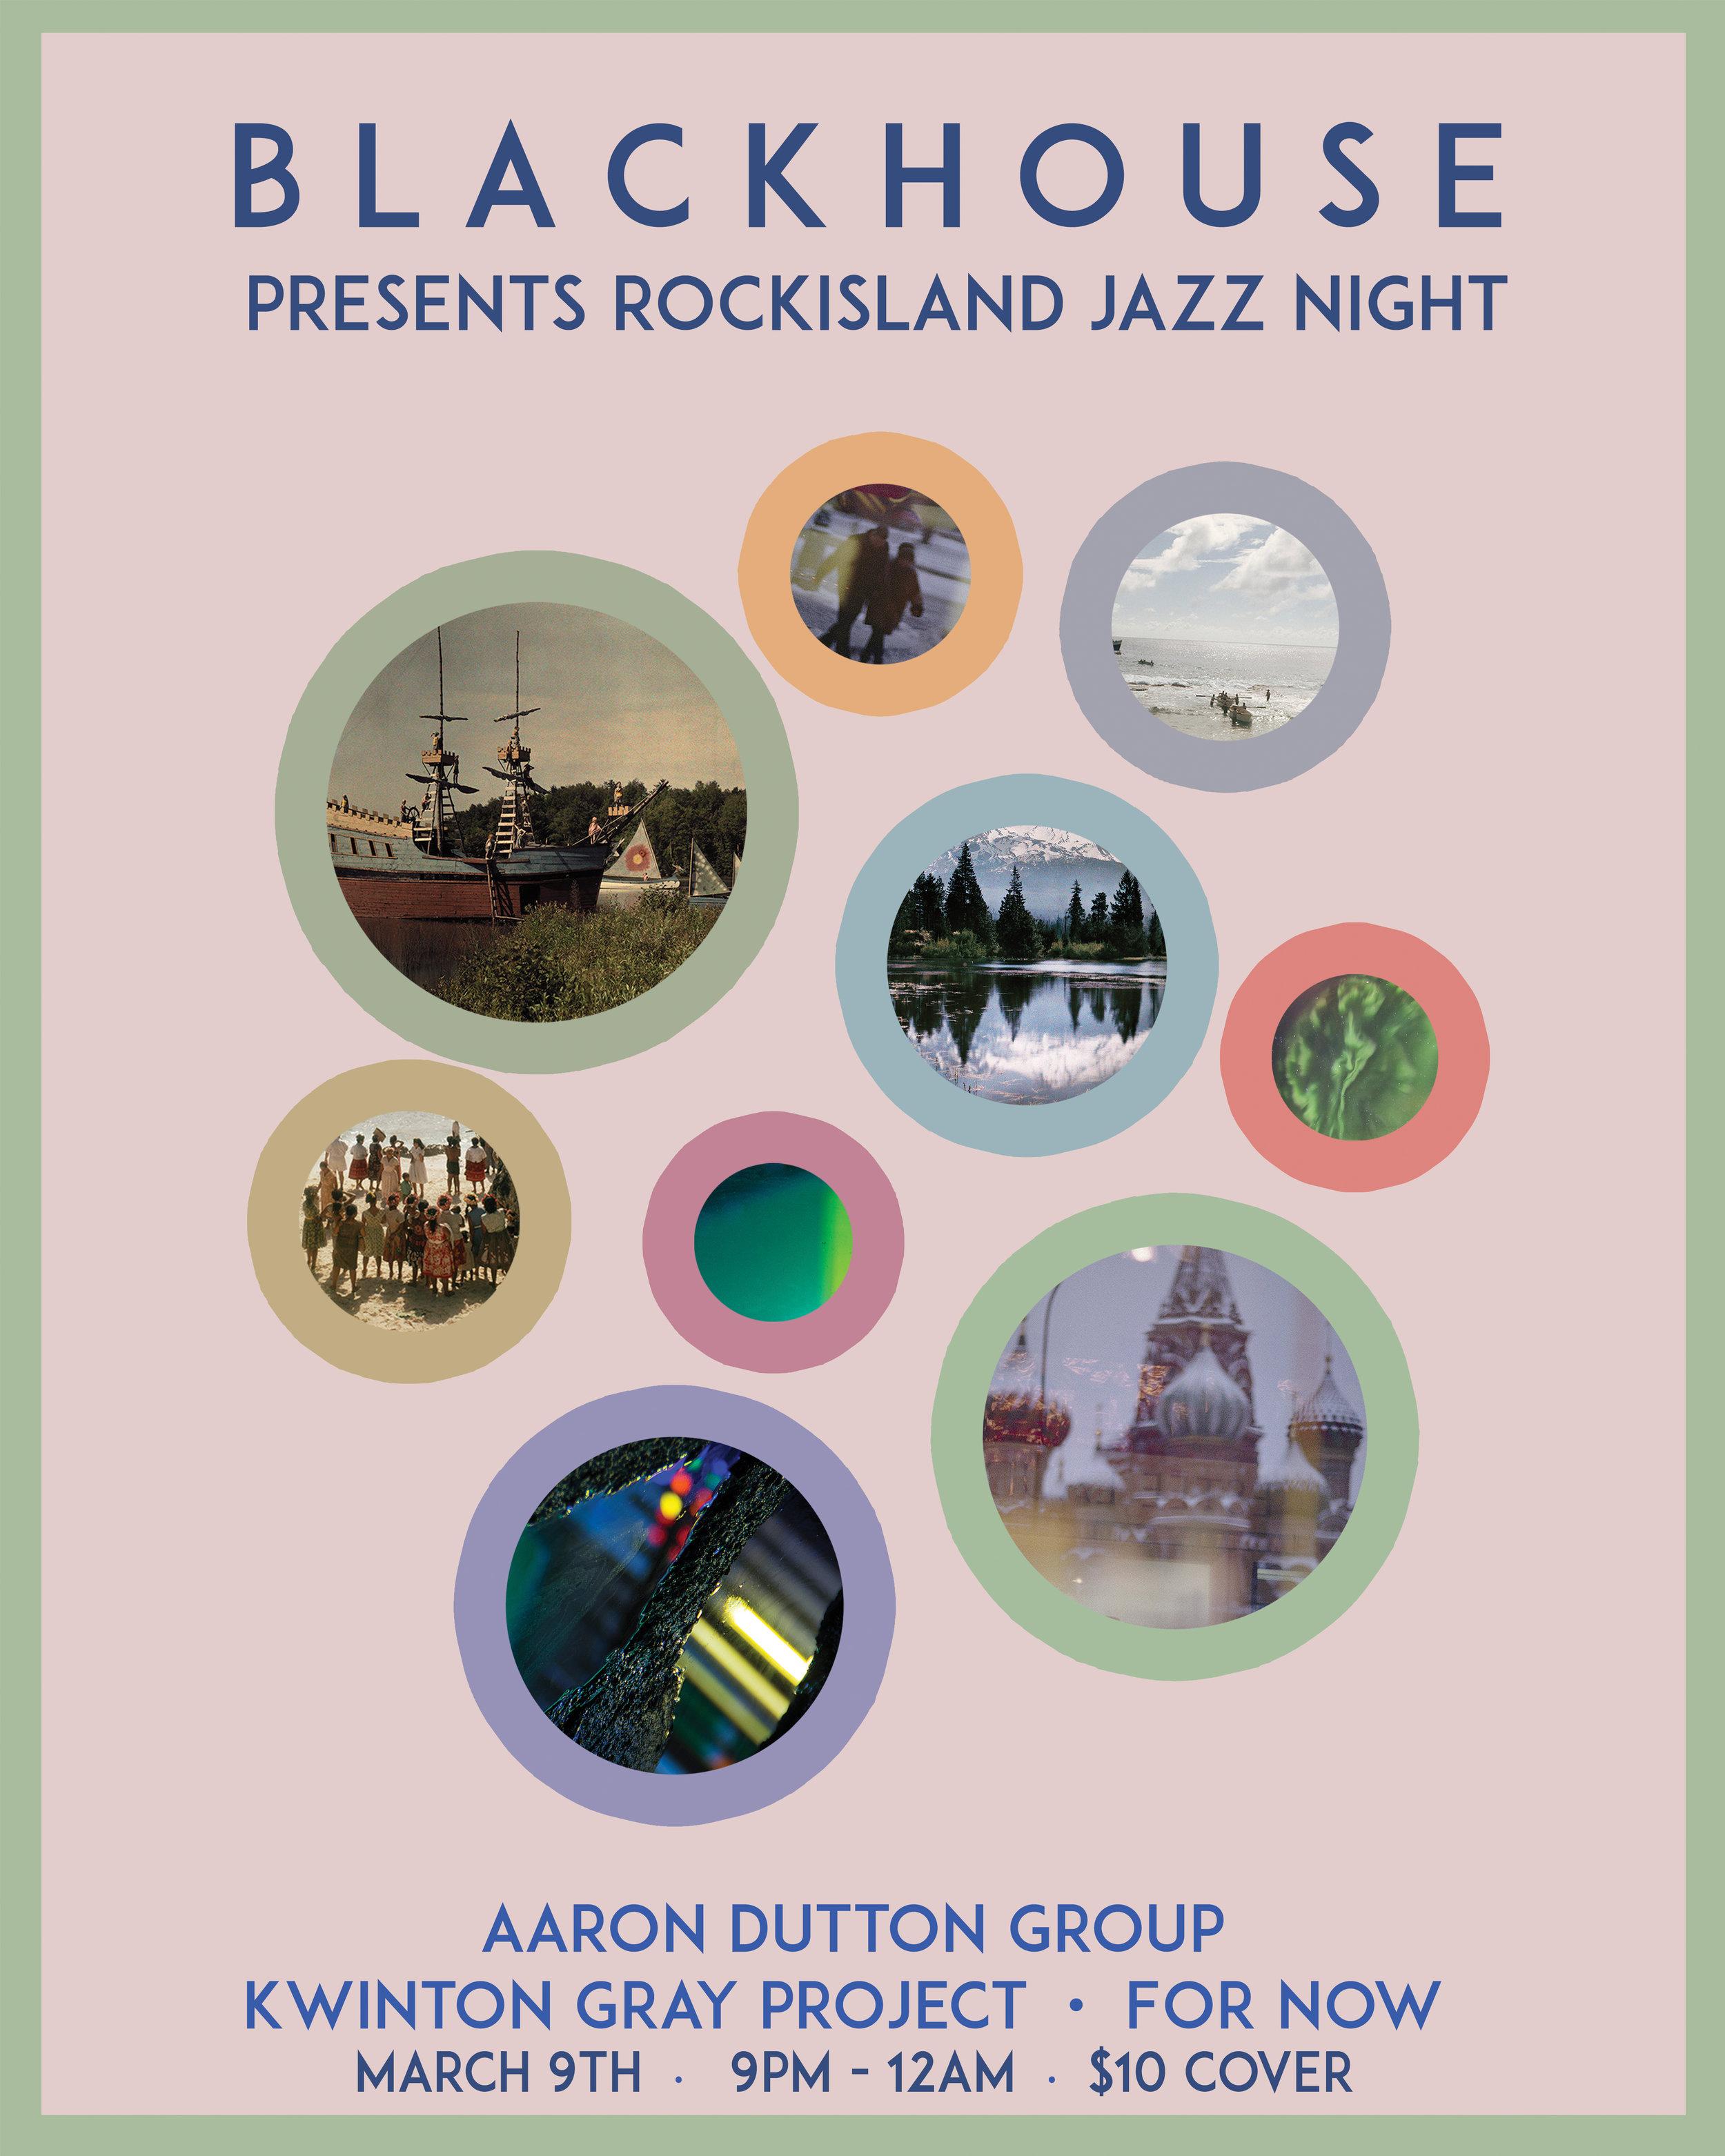 Jazz Night at FW Blackhouse 03.09.18 RGB IG Poster.jpg